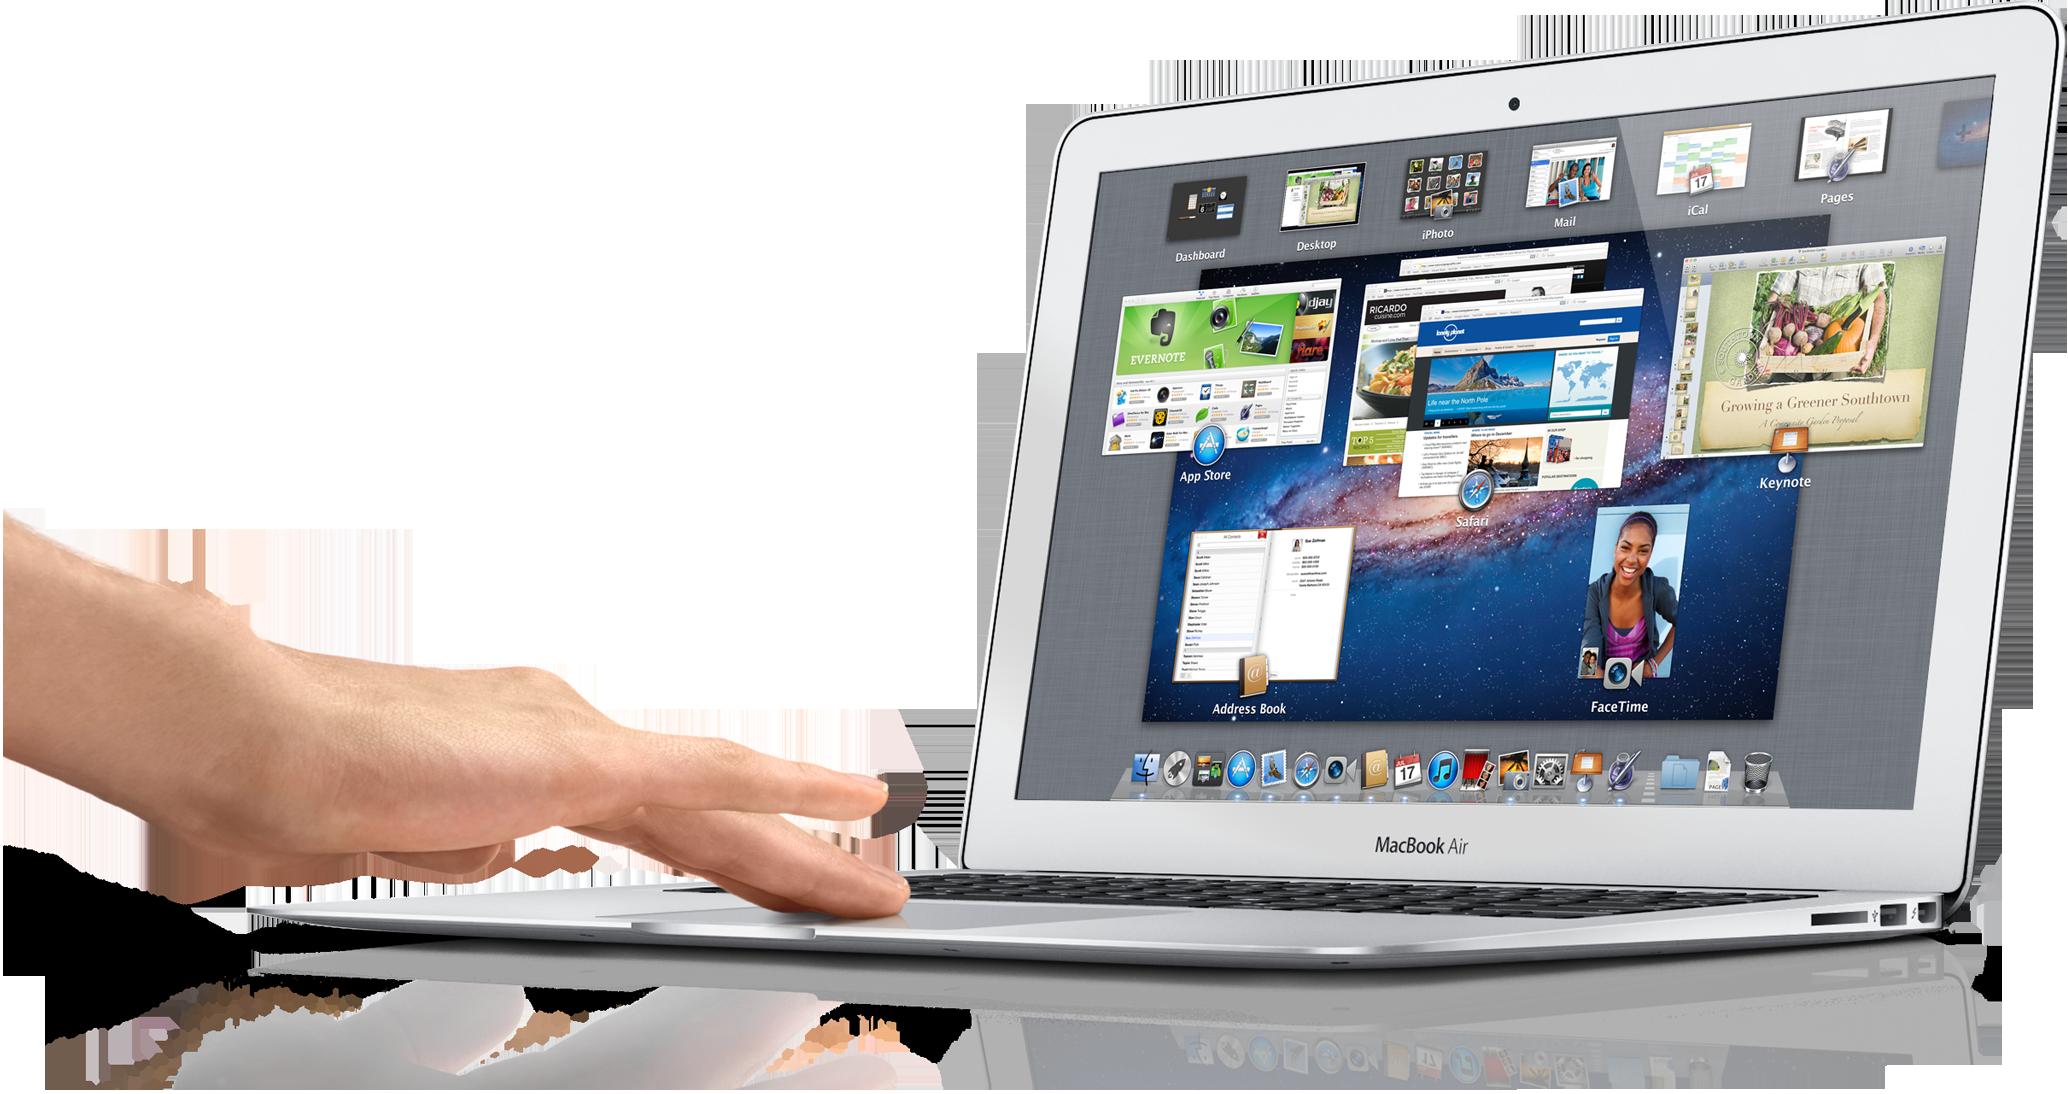 Apple Macbook Air The Ultimate Everyday Notebook Macbook Air Apple Macbook Air Macbook